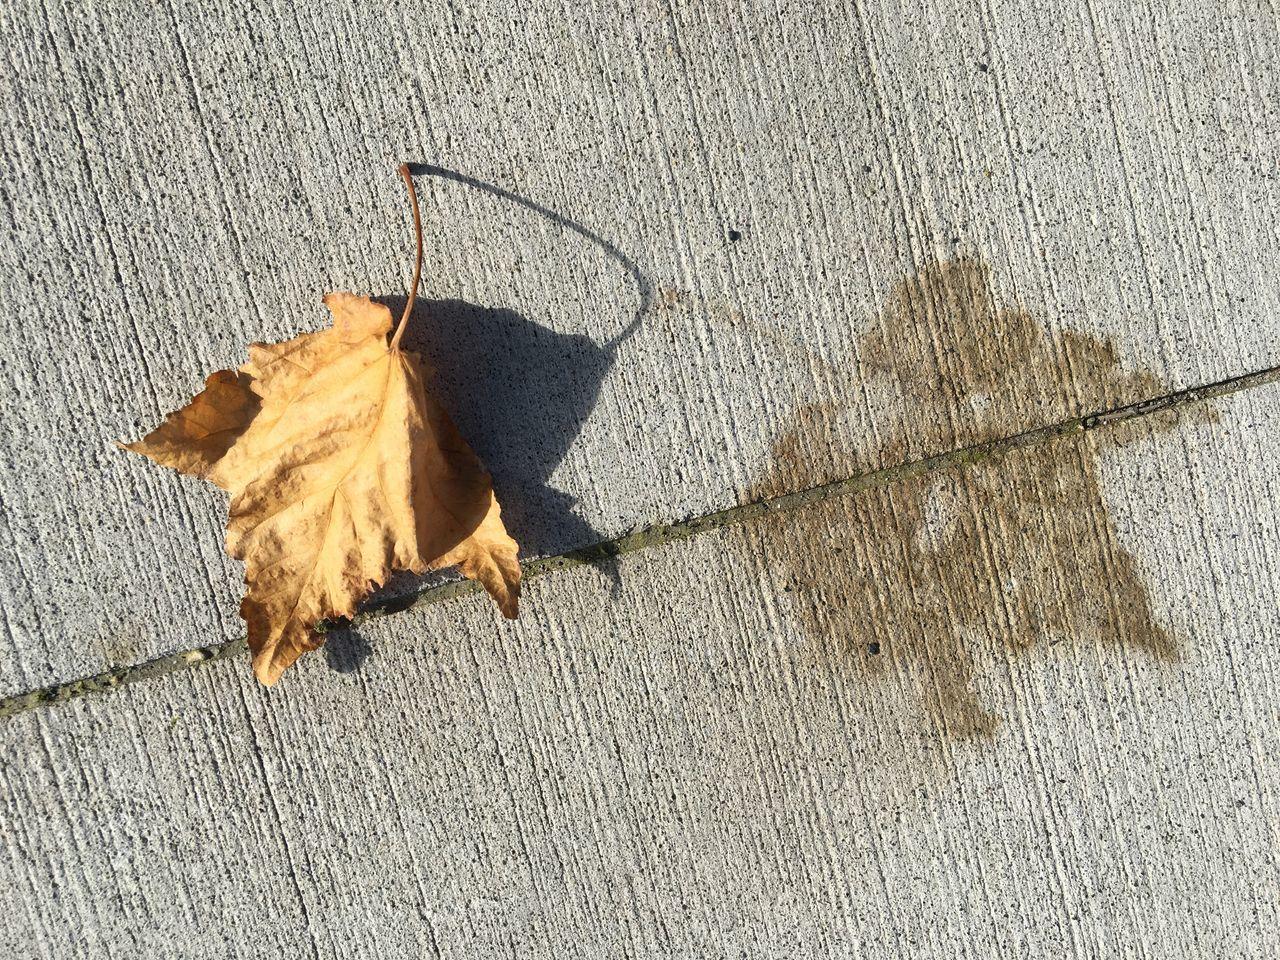 Autumn leaf and sidewalk leaf impression, Fragility, Patterns In Nature, Transitions